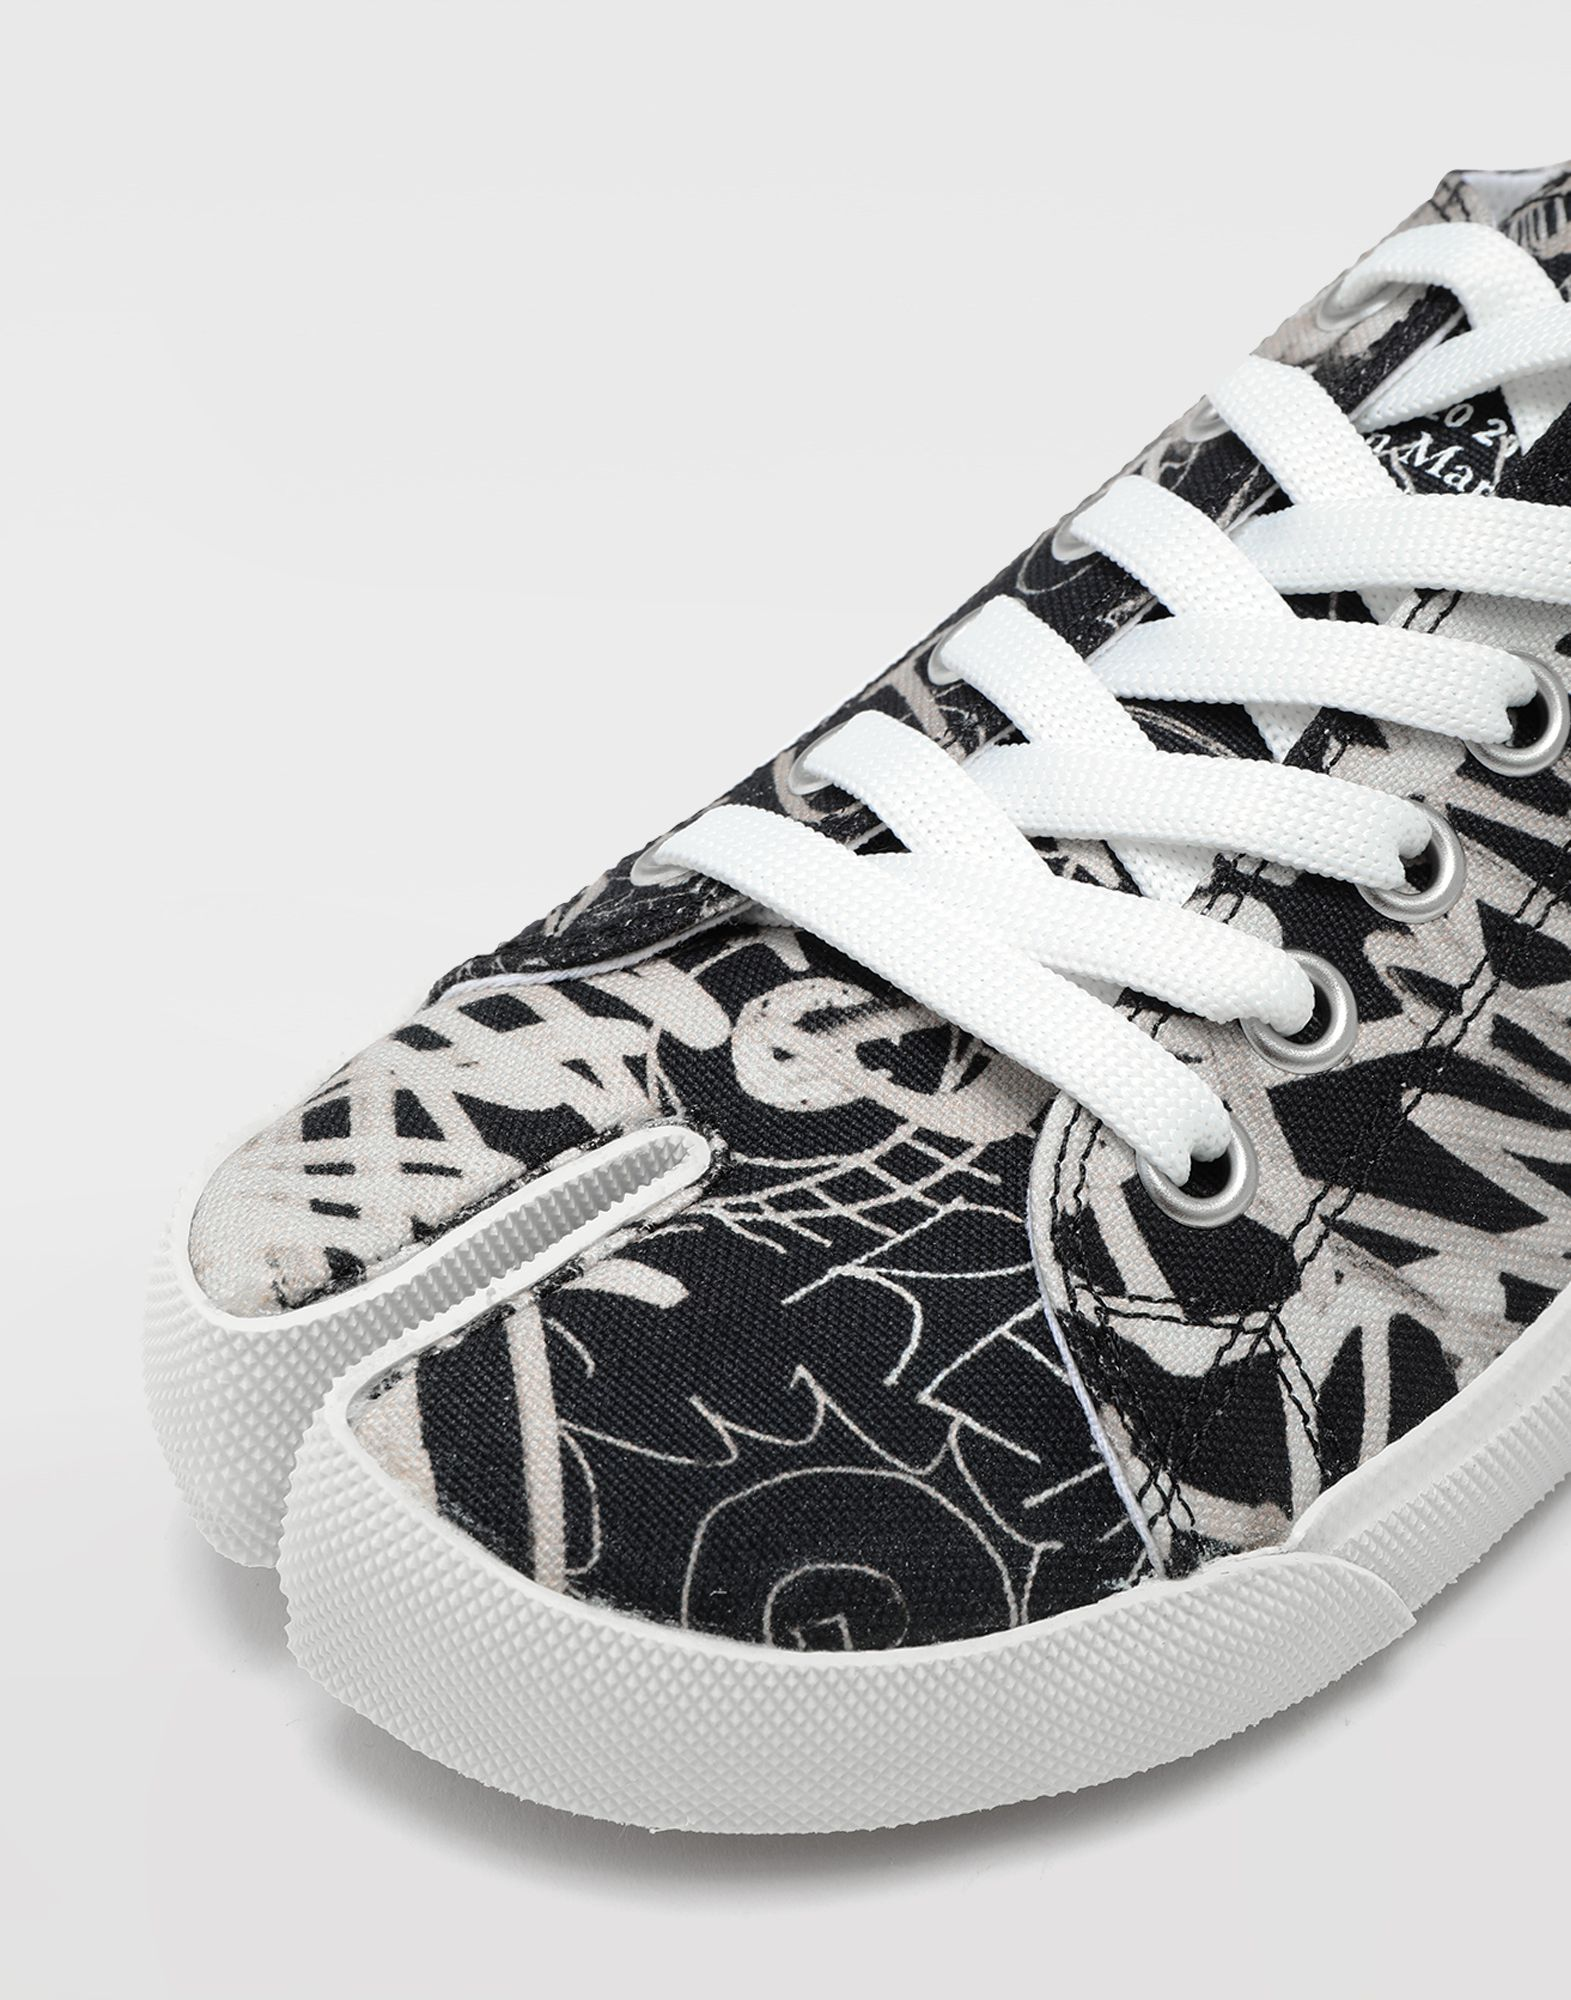 MAISON MARGIELA Graffiti Tabi sneakers Sneakers Tabi Woman a